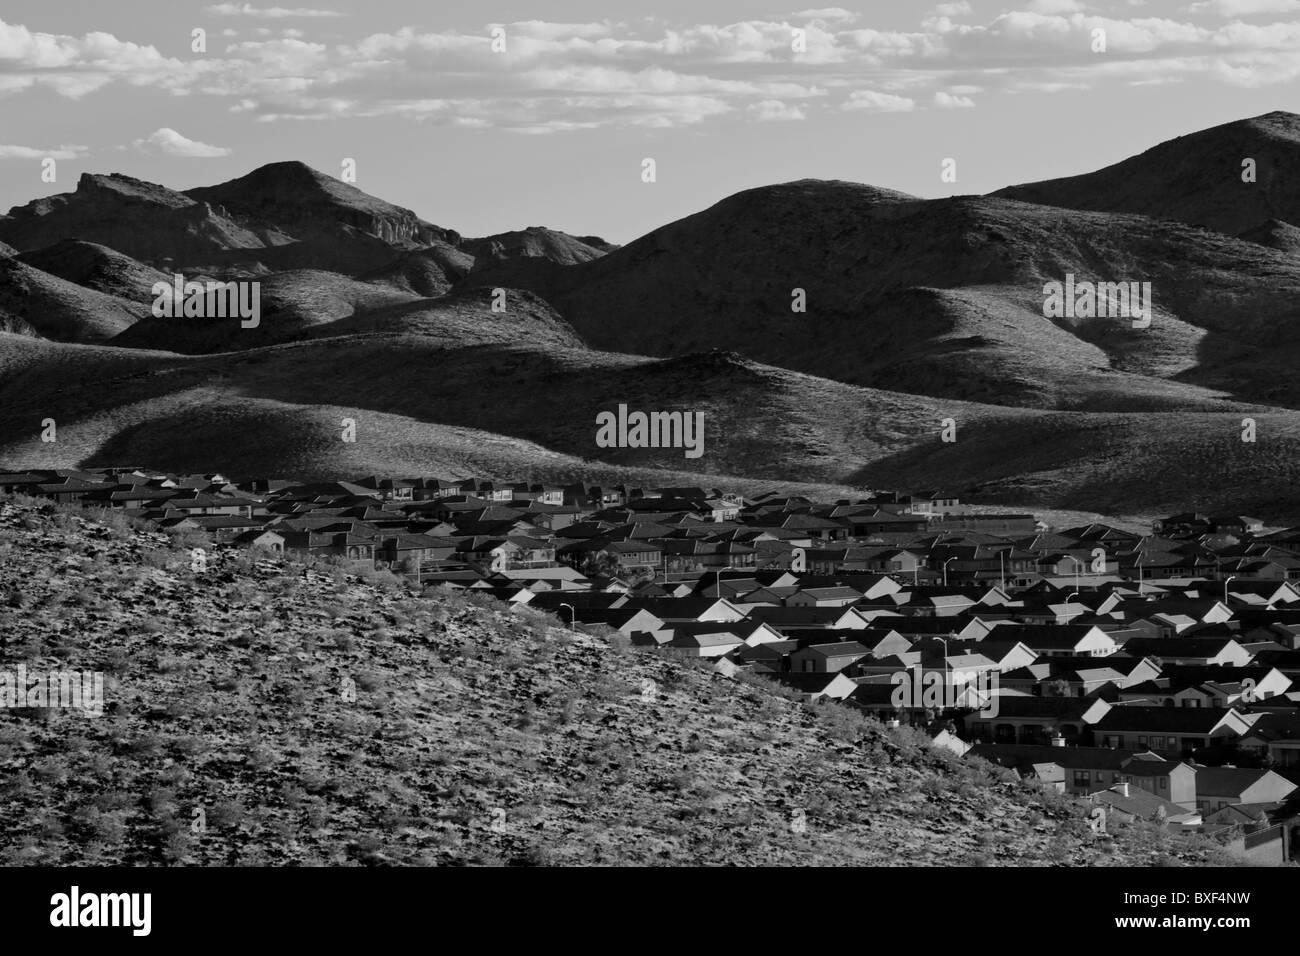 Suburban sprawl into the wilderness - Stock Image